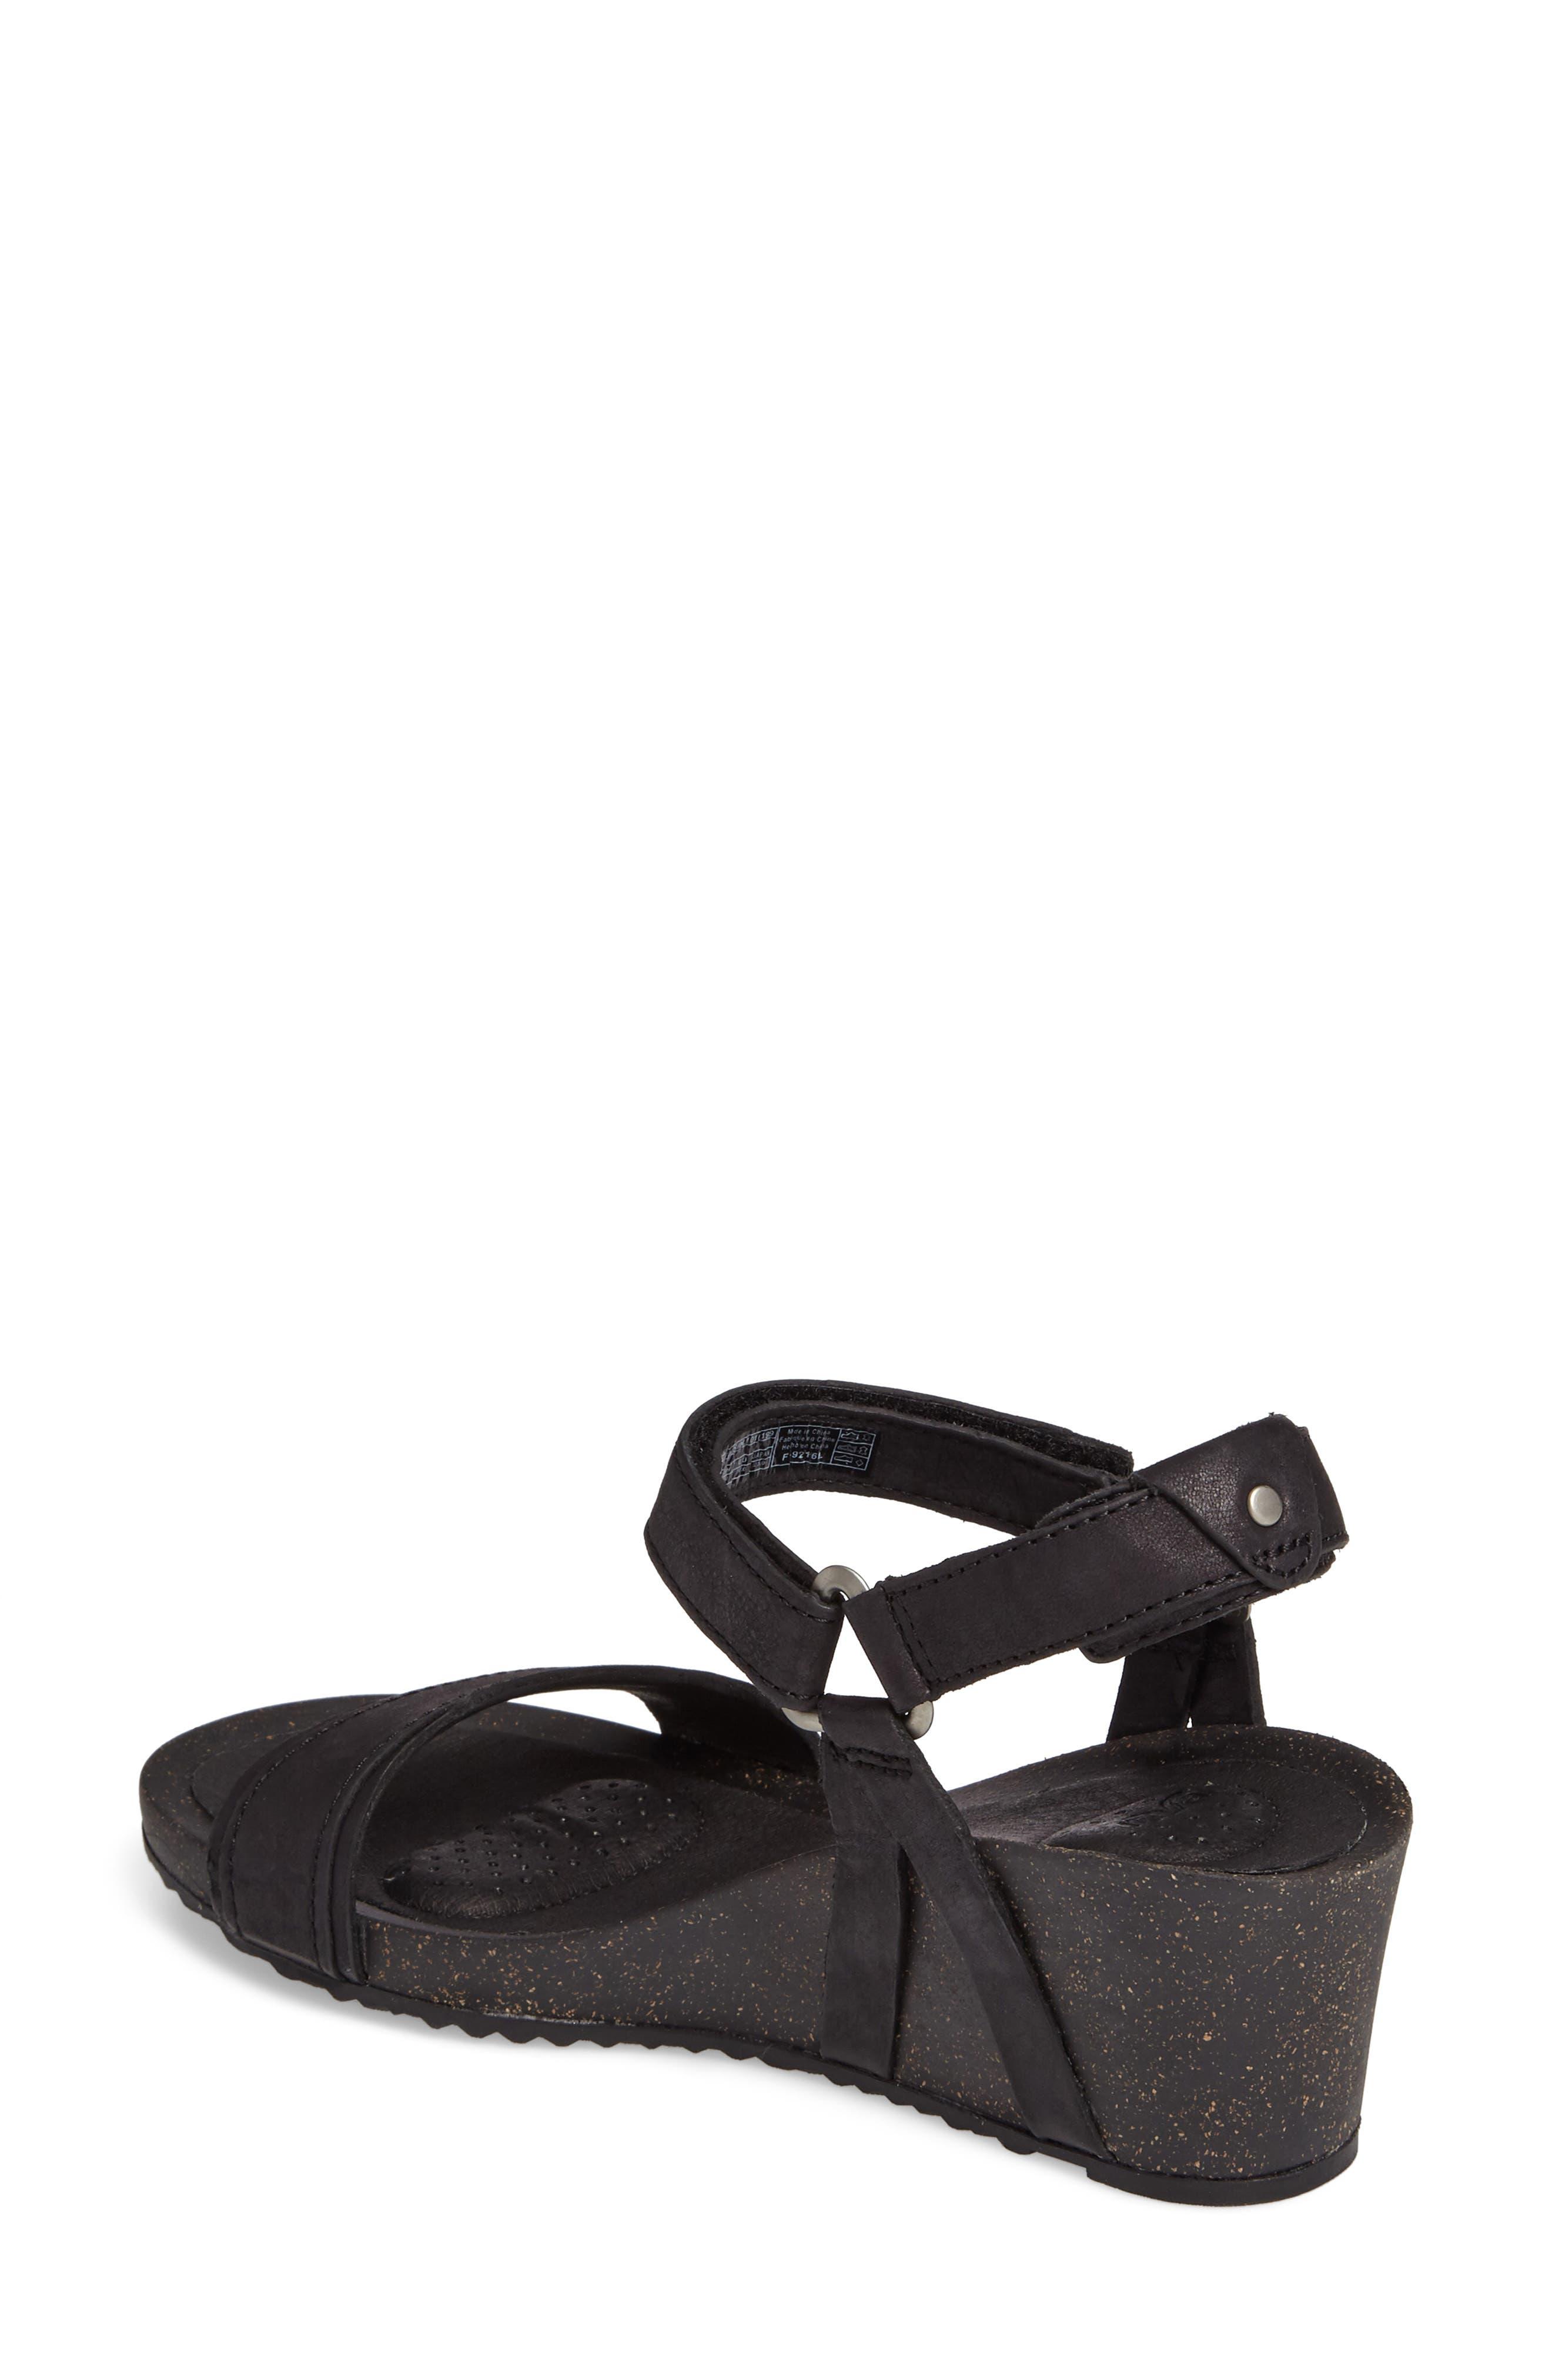 Ysidro Stitch Wedge Sandal,                             Alternate thumbnail 2, color,                             Black Leather